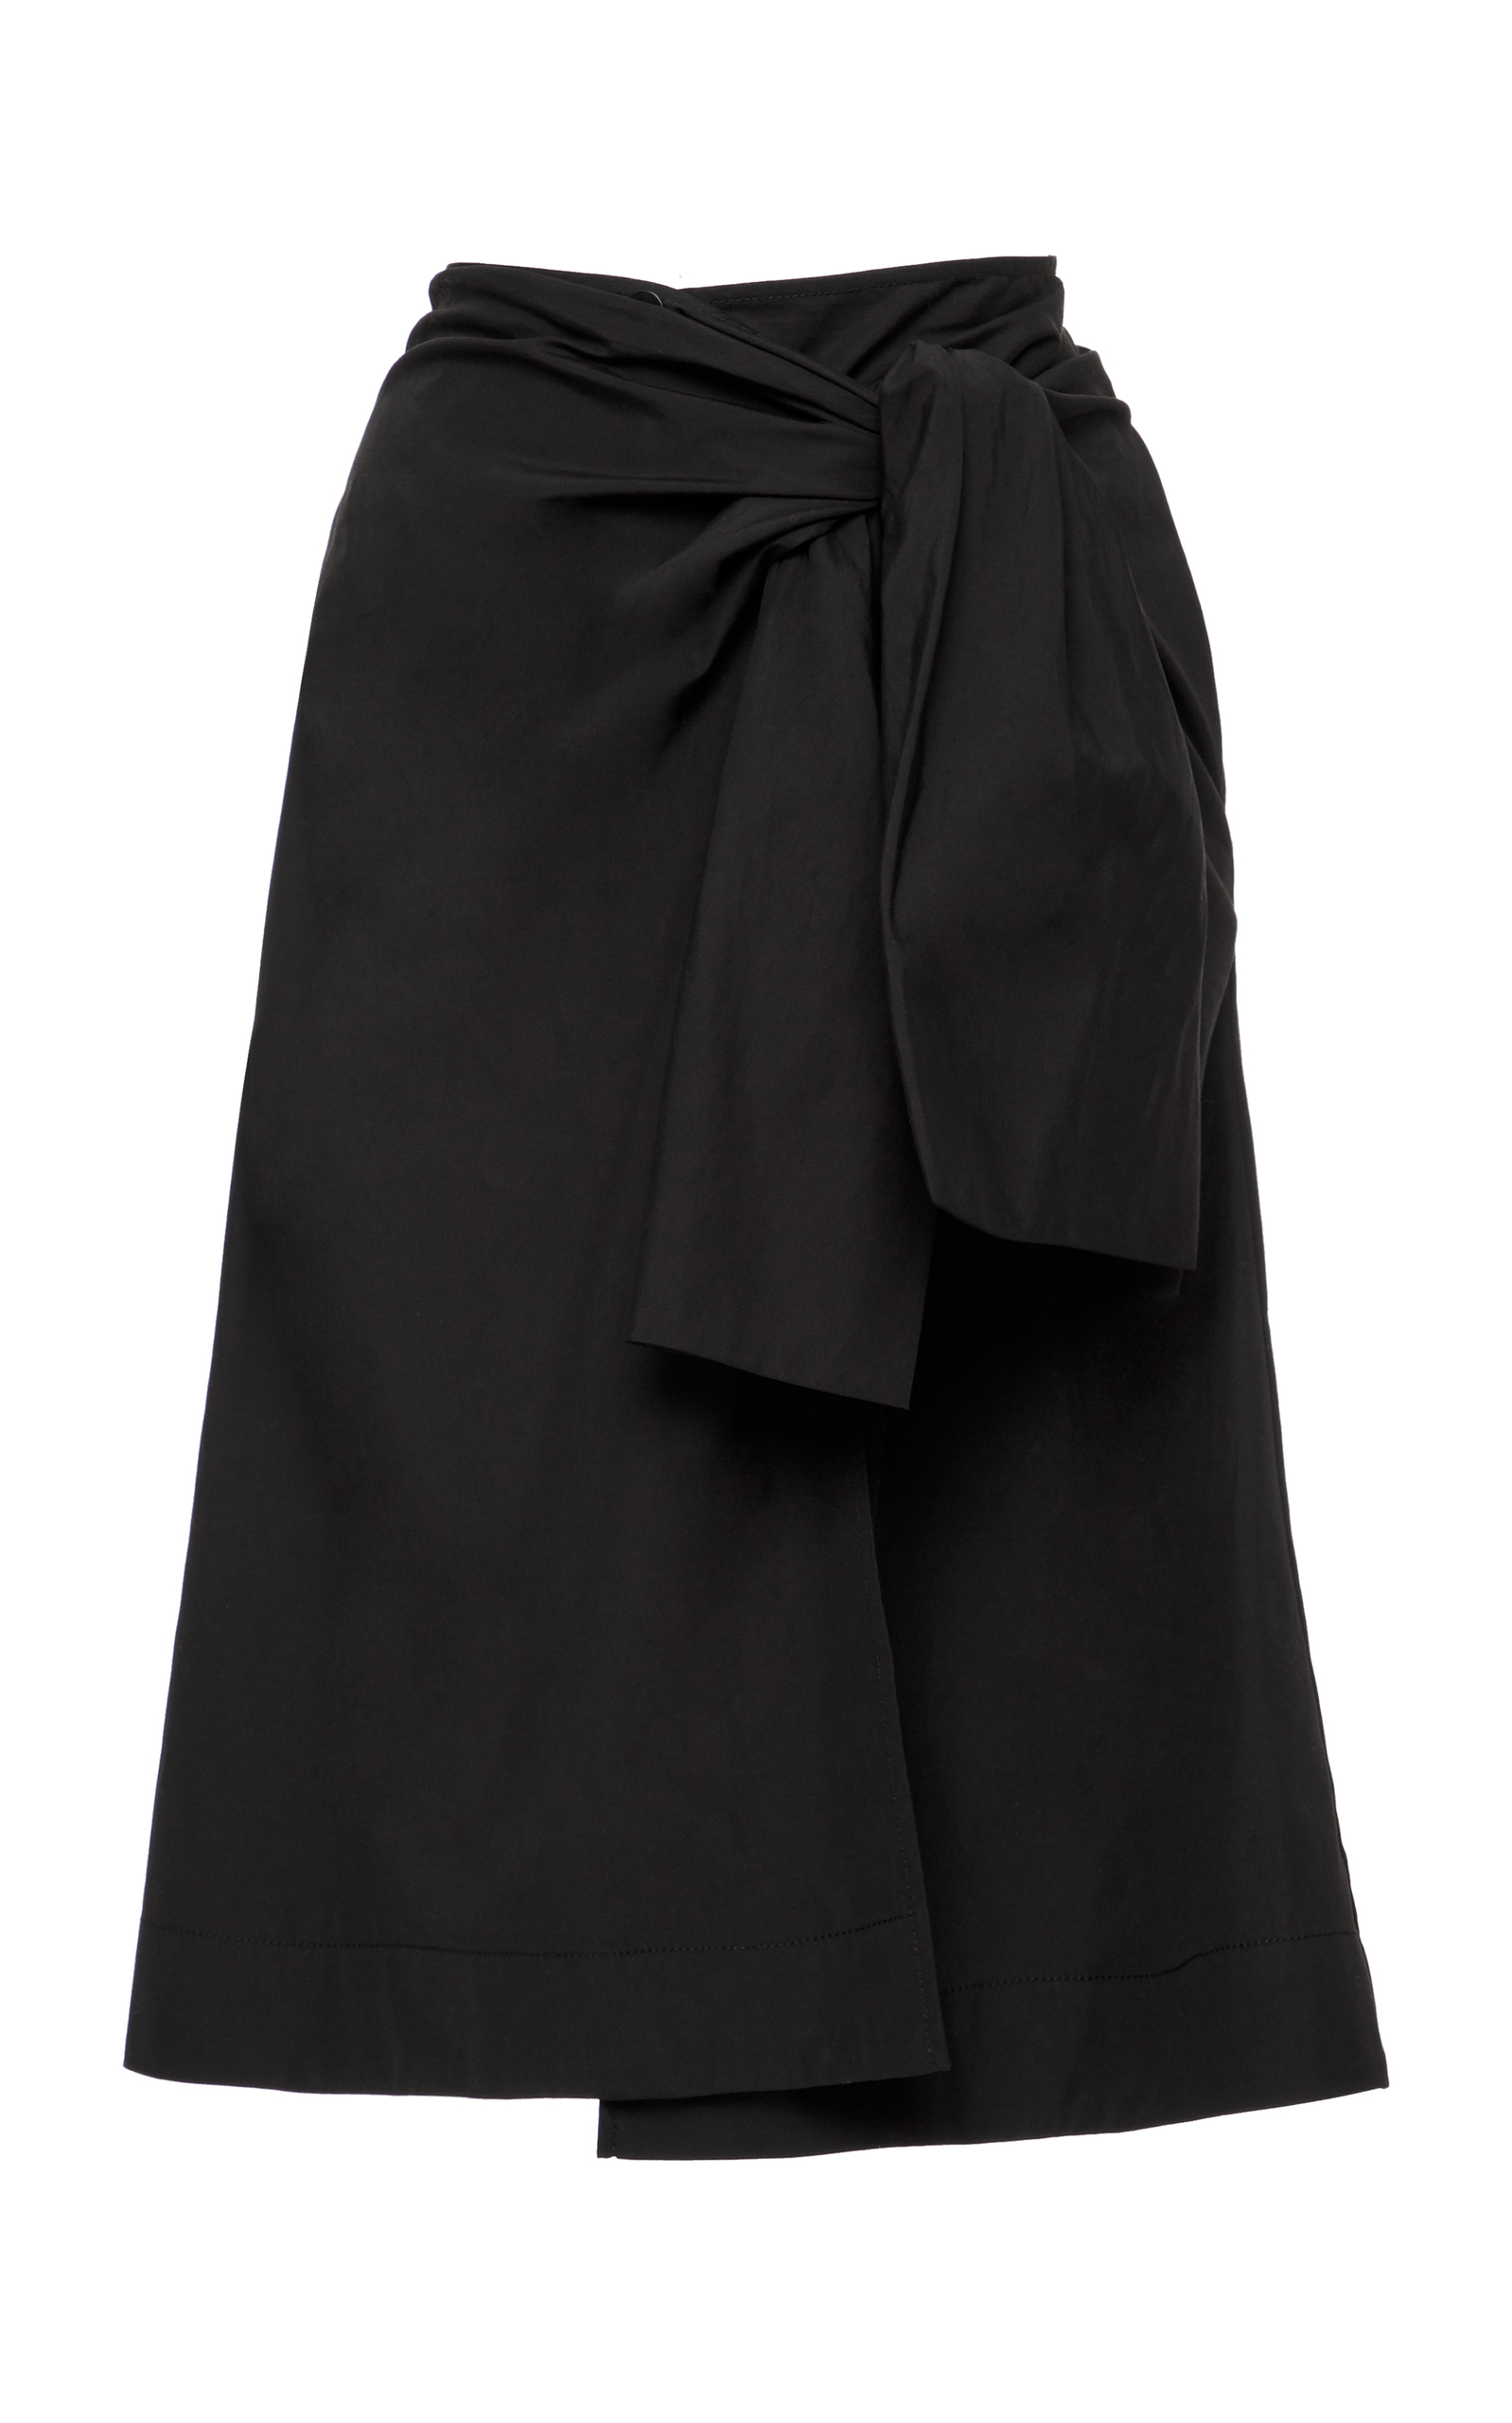 Waist Tie Front Slit Solid Skirt in Black